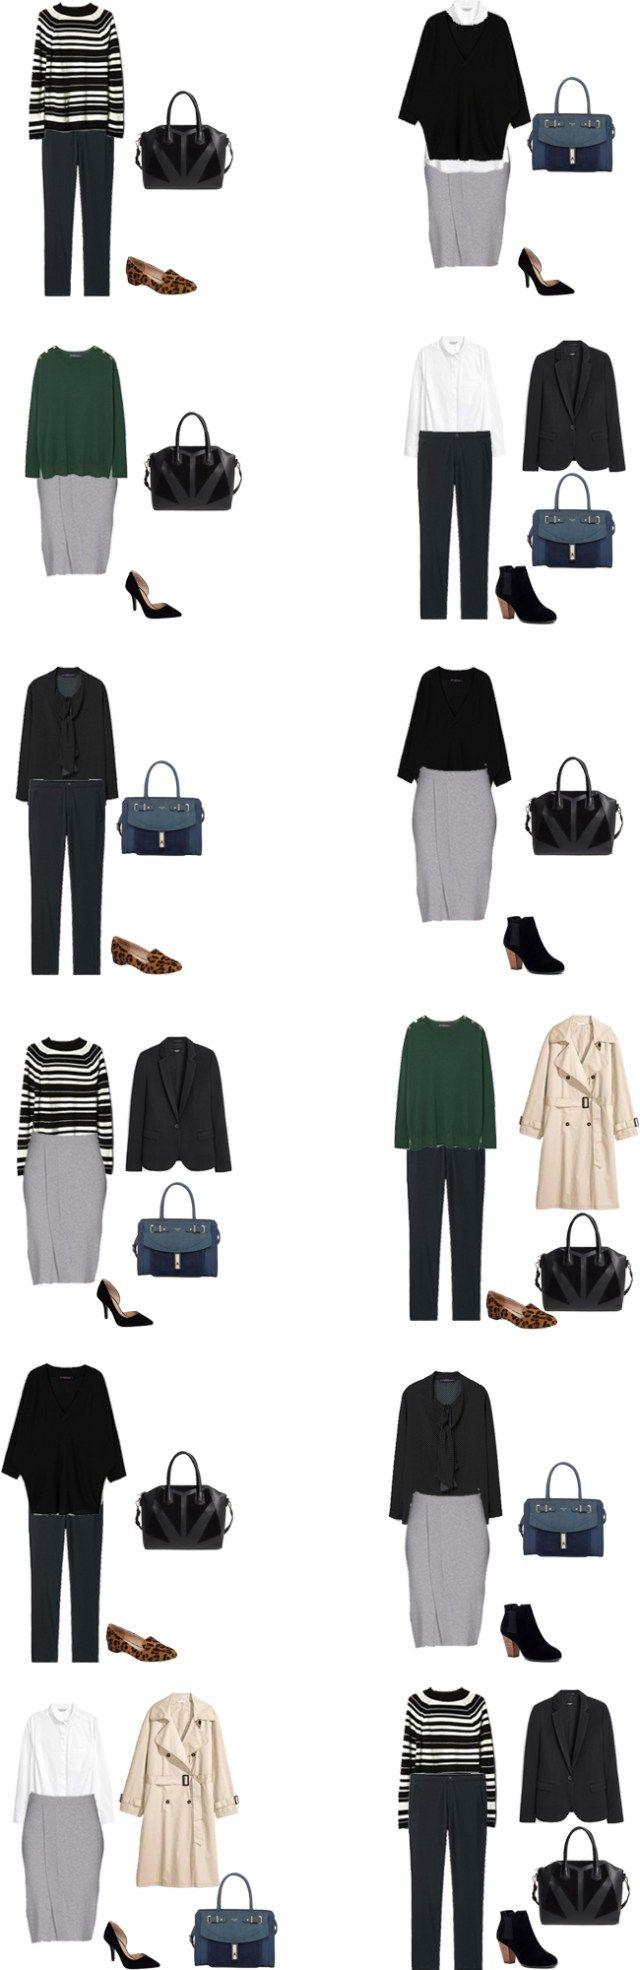 Back to Basics. Spring Starter Work Capsule Wardrobe 2017. Outfit Options. livelovesara